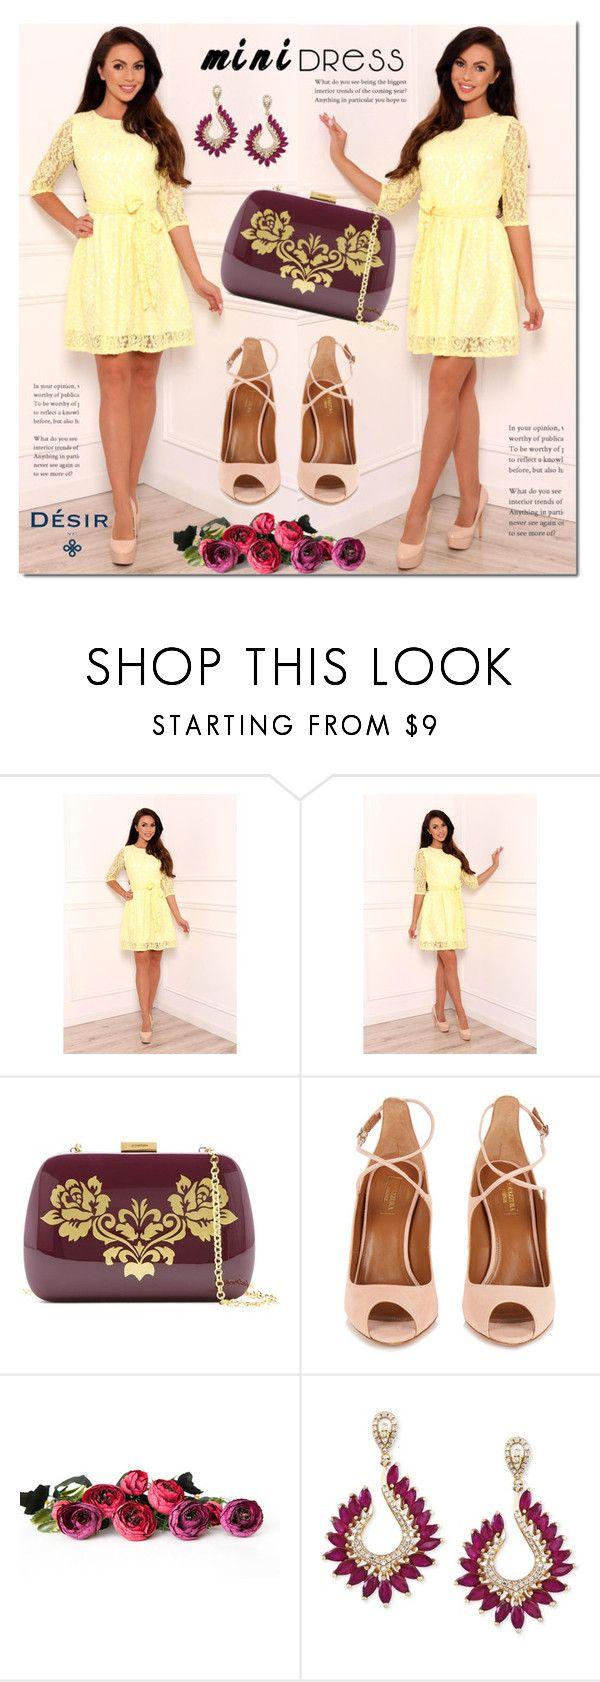 Yellow mini dress by Desir Vale by mada-malureanu on Polyvore featuring Aquazzura, Serpui, Effy Jewelry, dress, summerstyle, minidress, dreamydress and DesirVale